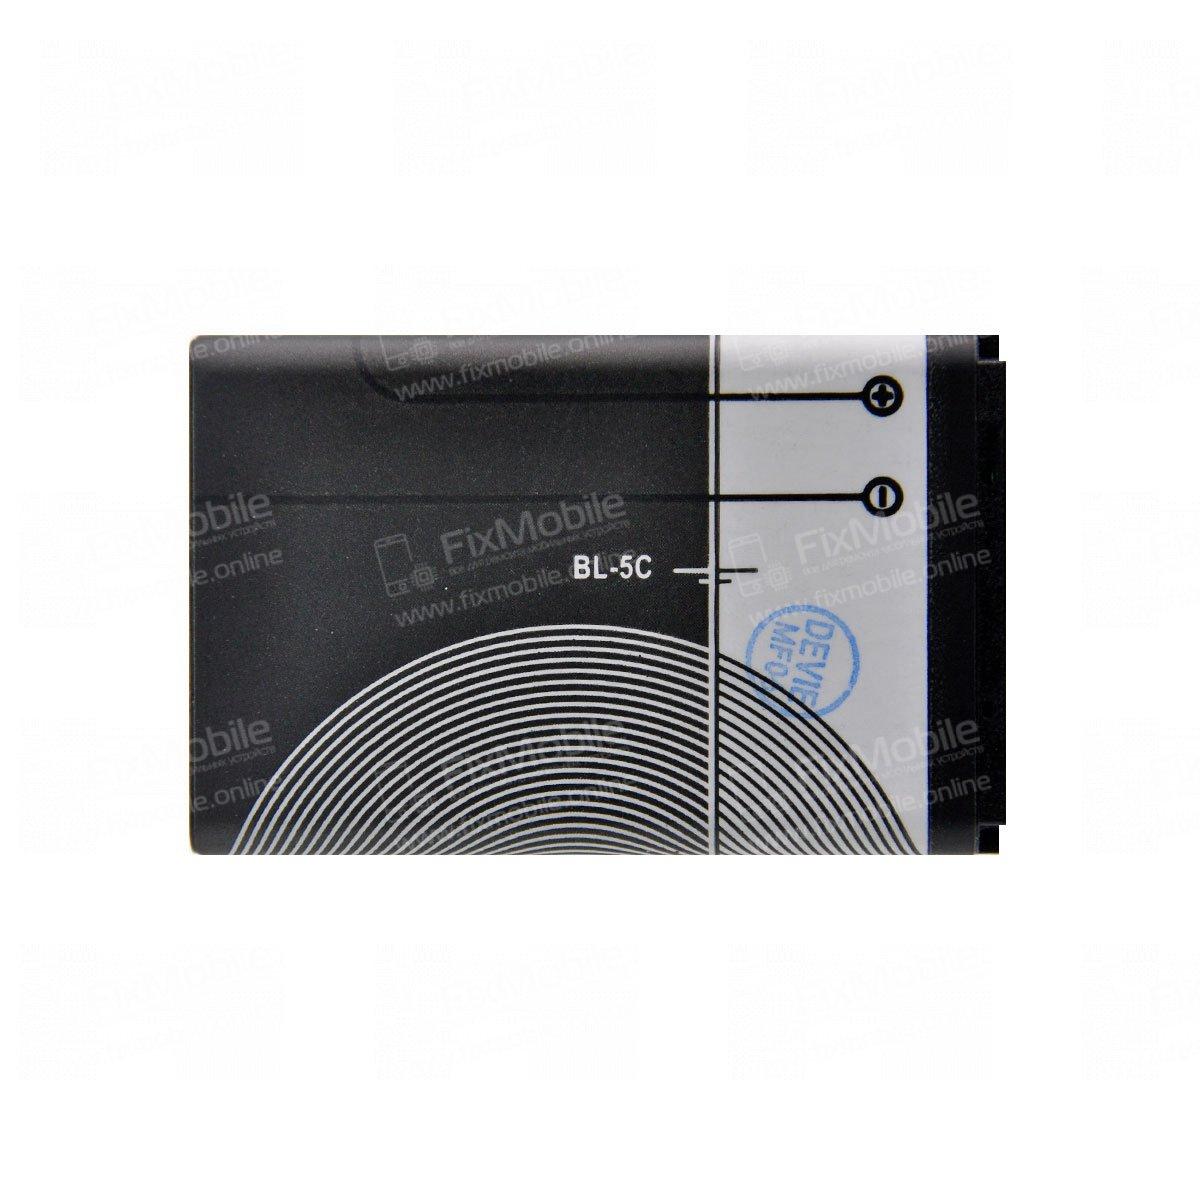 Аккумуляторная батарея для Nokia 208 BL-5C